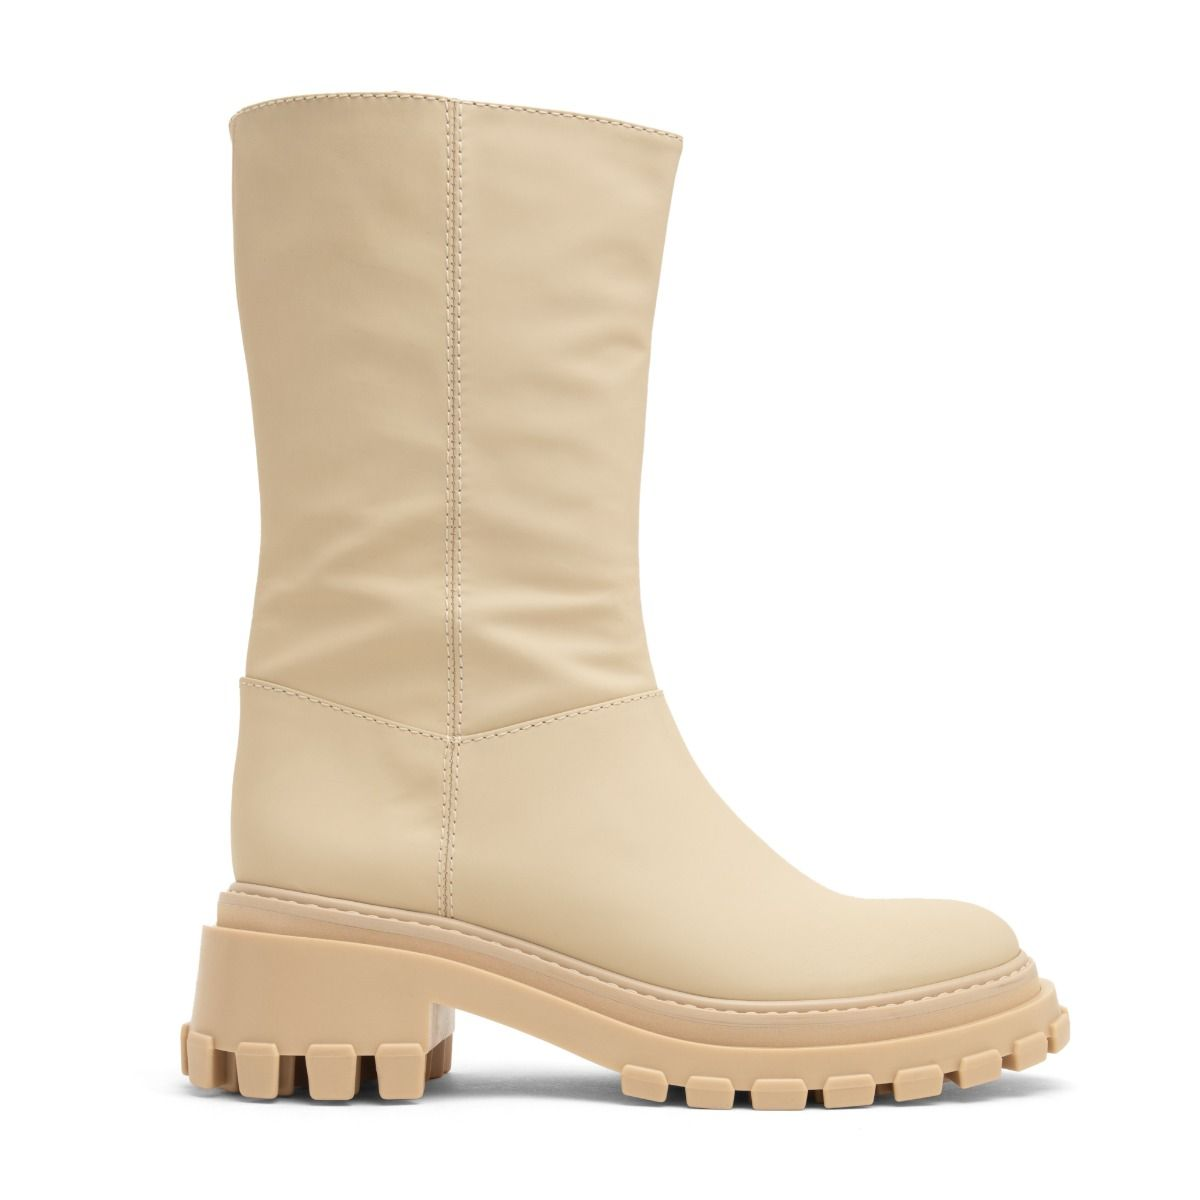 Juany boots